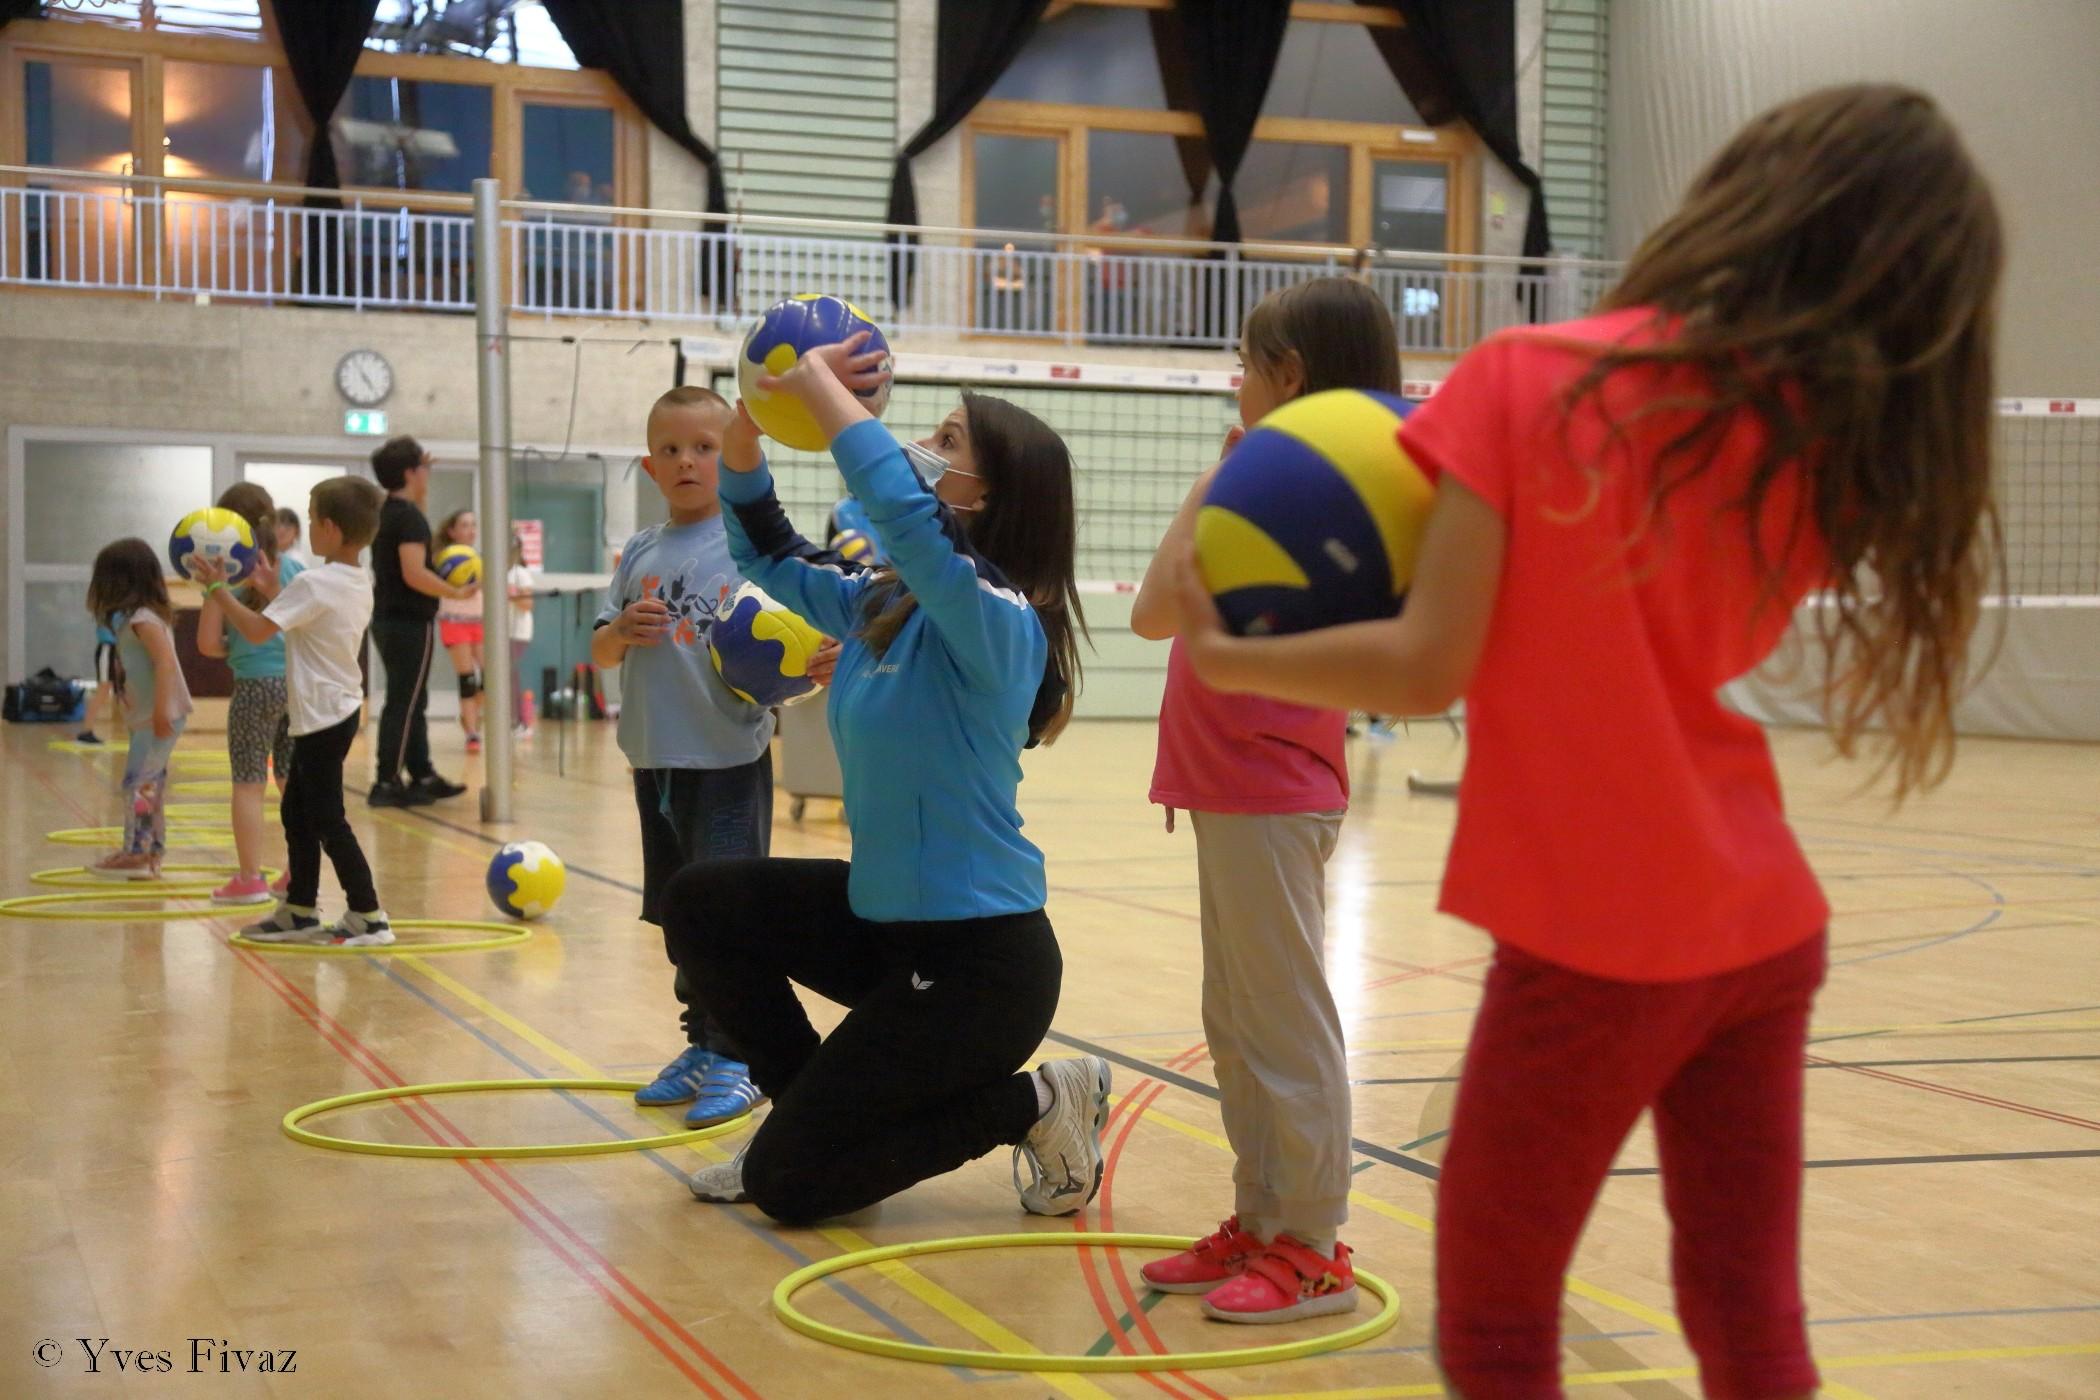 20210430_FYN_010_Kids academy Volley